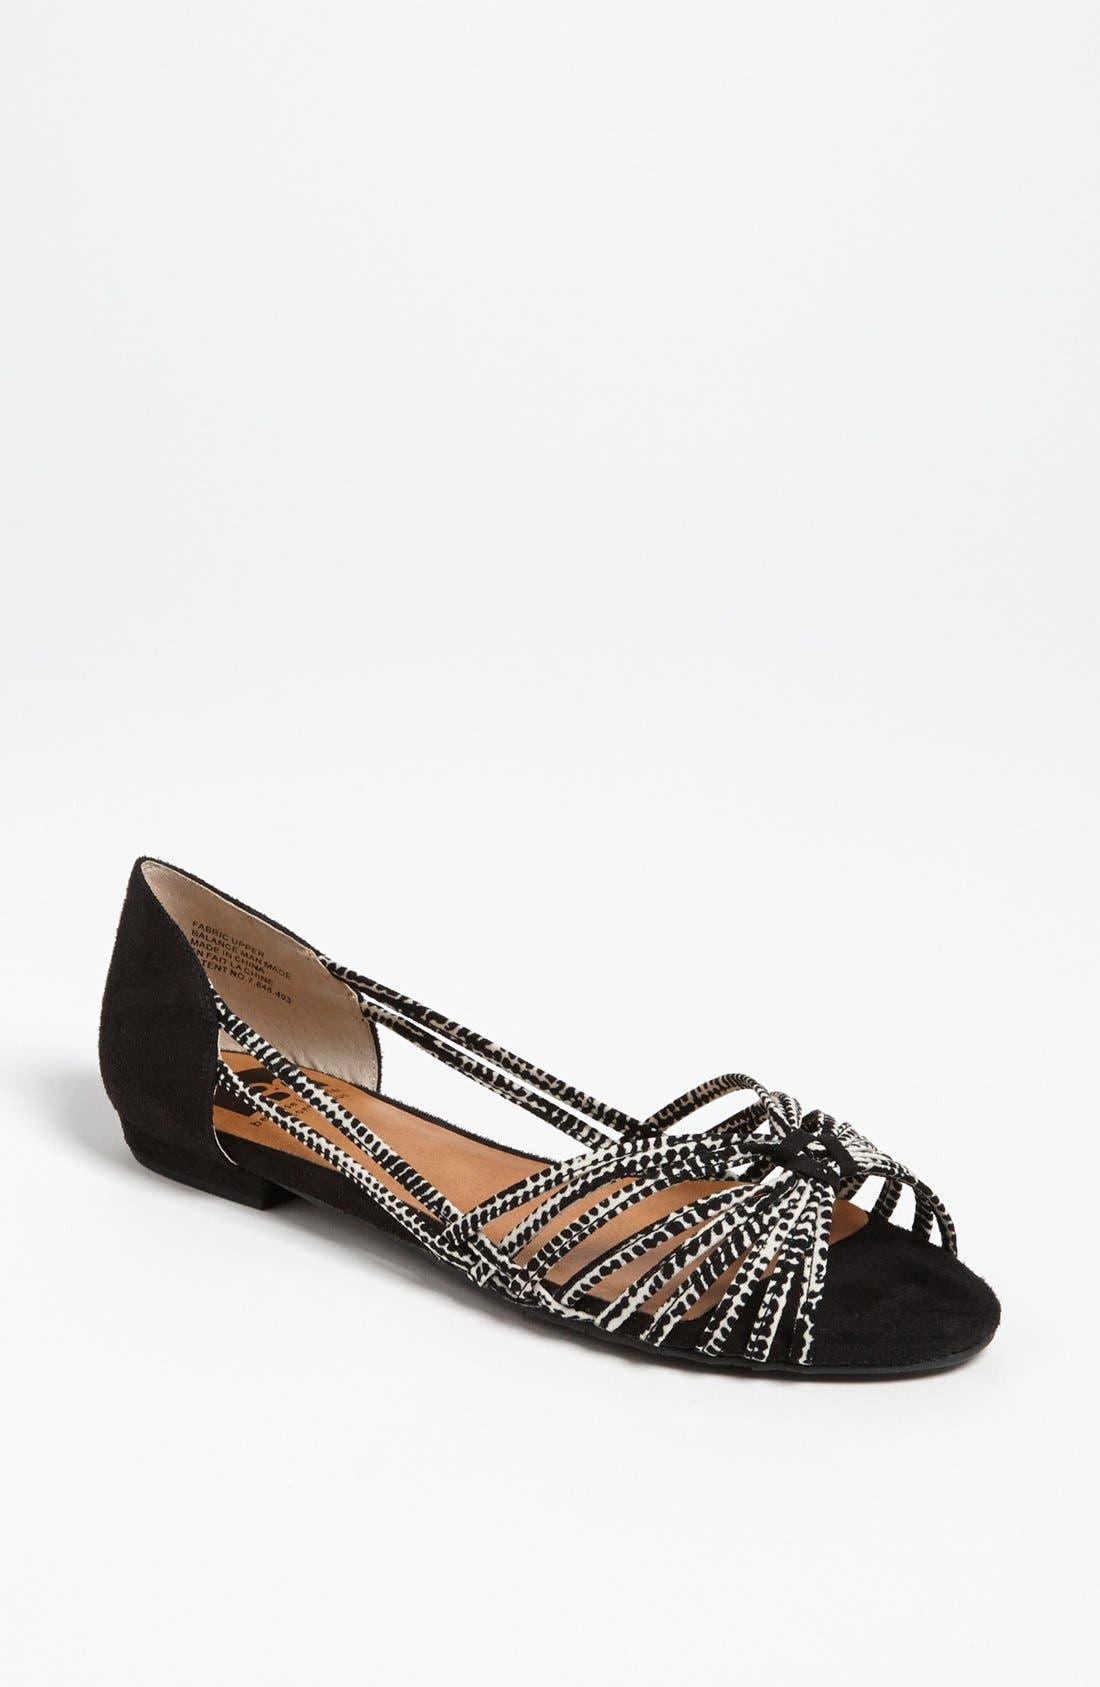 Alternate Image 1 Selected - BC Footwear 'Sharp as a Tack' Sandal